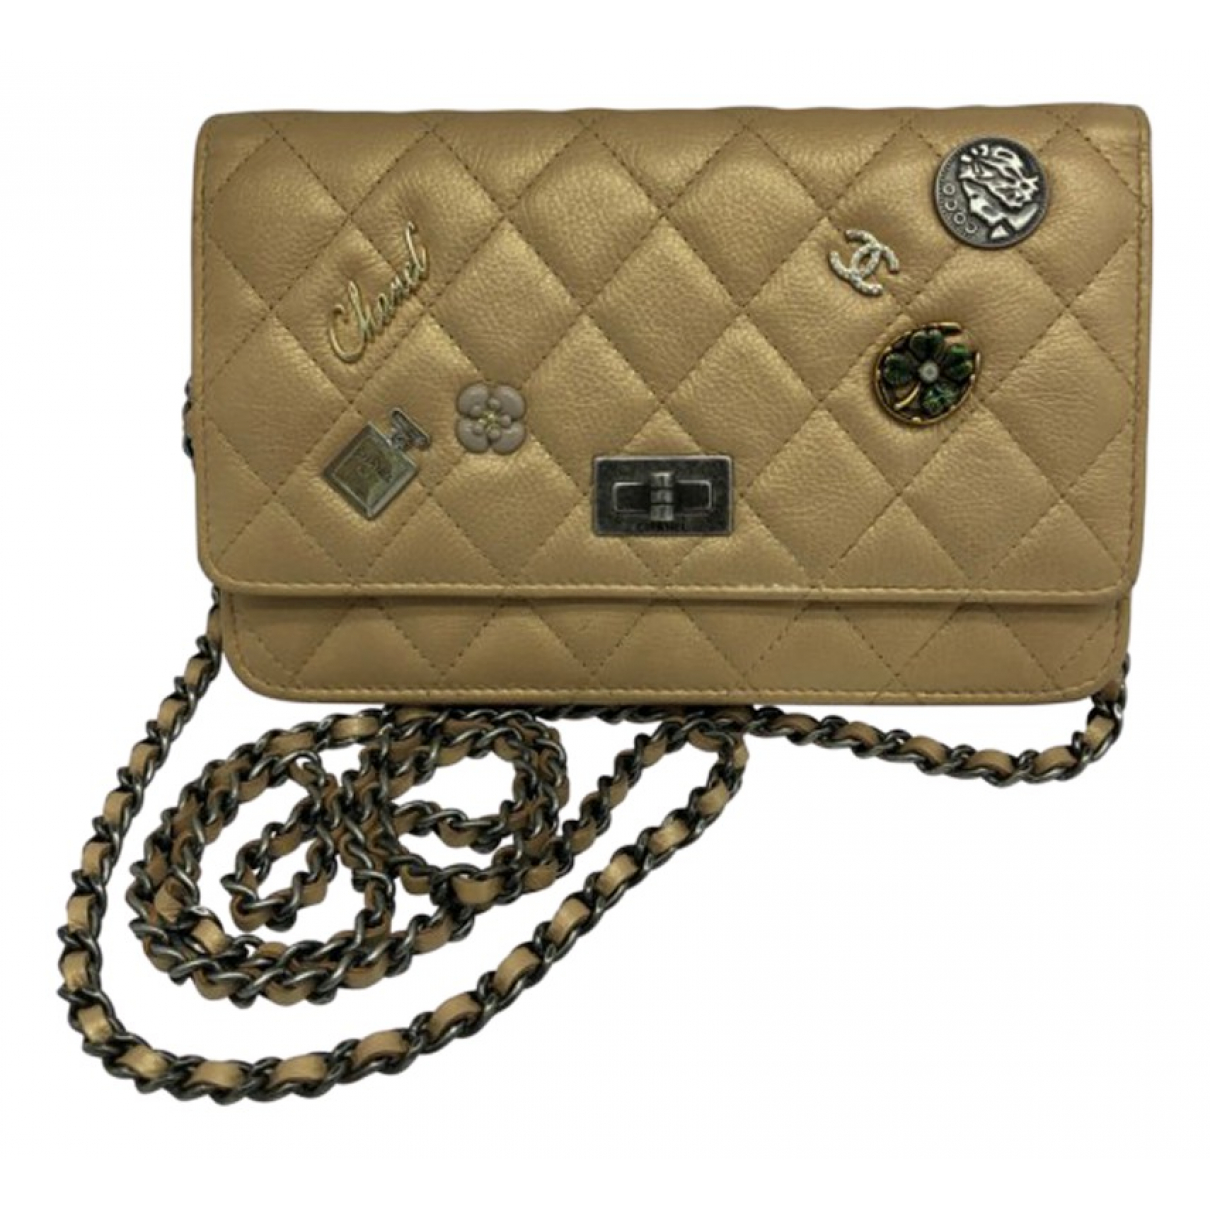 Chanel - Sac a main Wallet on Chain pour femme en cuir - dore